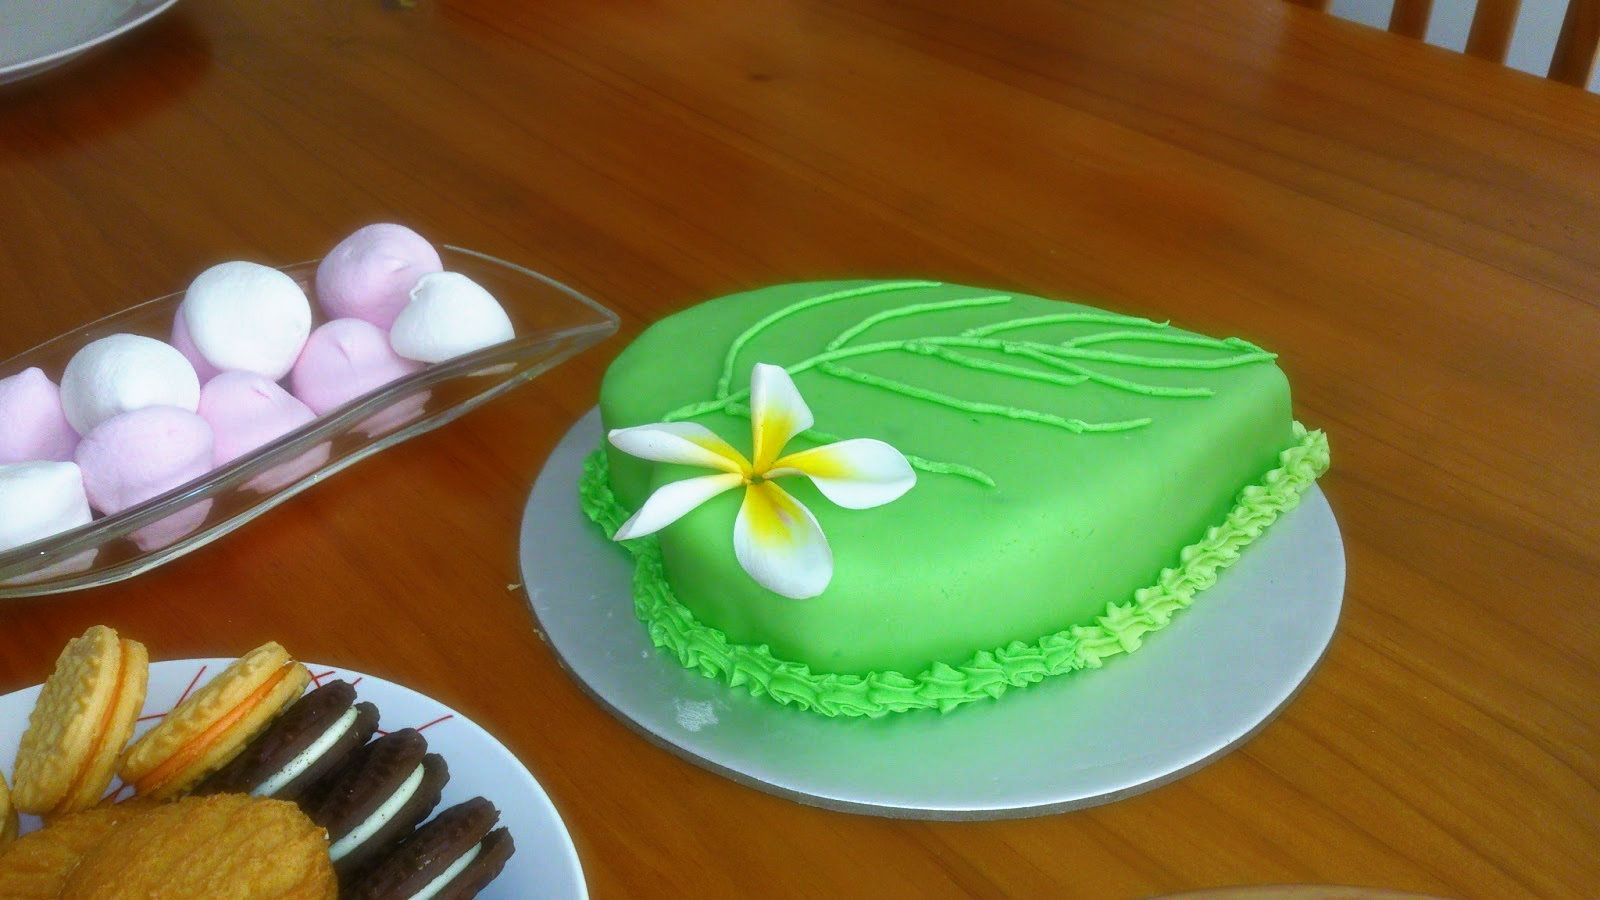 cake icing design sinhala Celebrating Sri Lankan New Year in style, the betel leaf cake